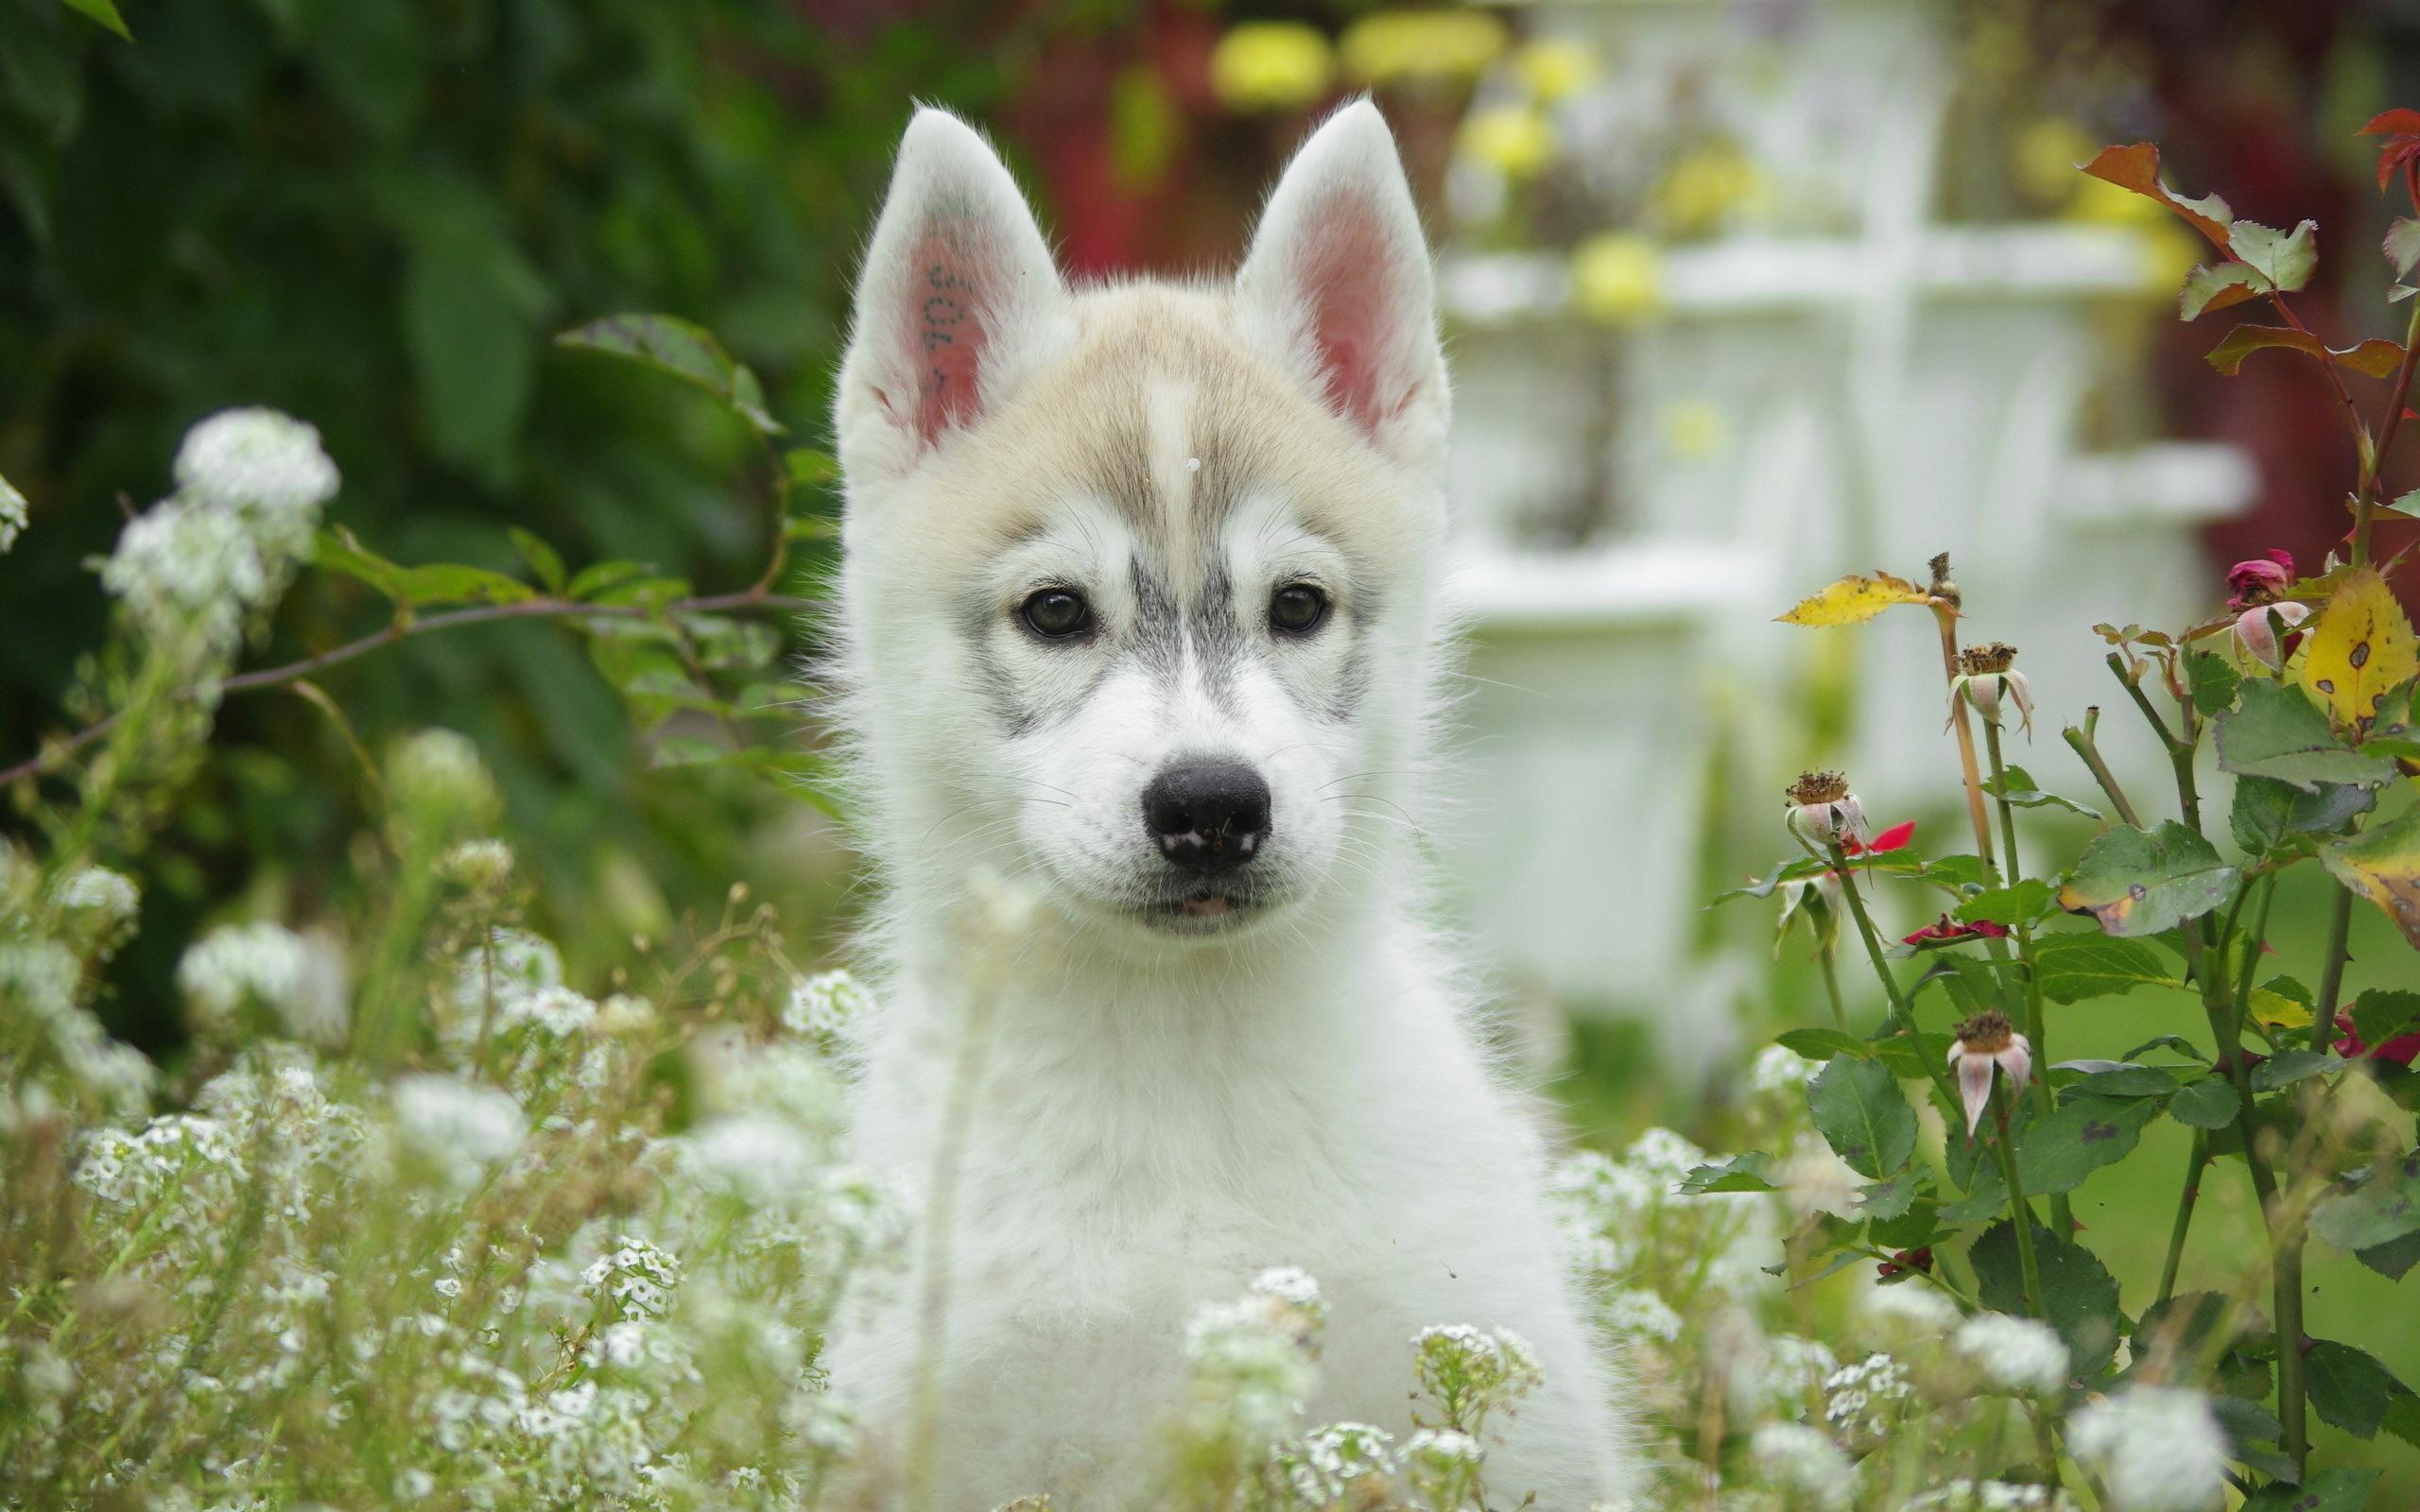 Perros Husky Siberiano Fondos De Pantalla Hd De Animales 2: Hintergrundbilder Alaskan Malamute Hunde Tiere